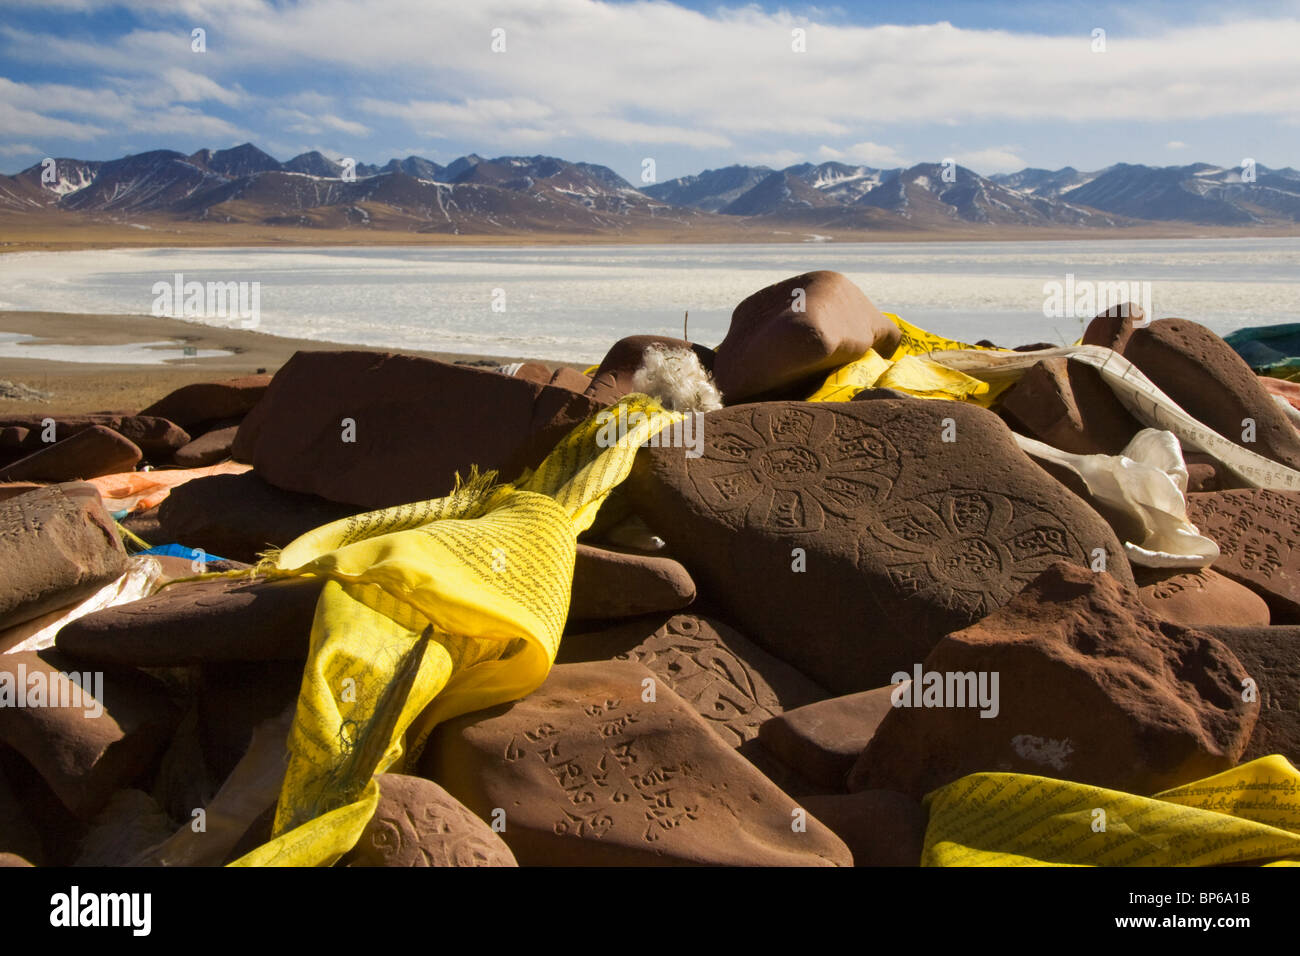 Tibetan prayer flags hug sanskrit engraved stones at the edge of Lake Namsto, Tibet. - Stock Image